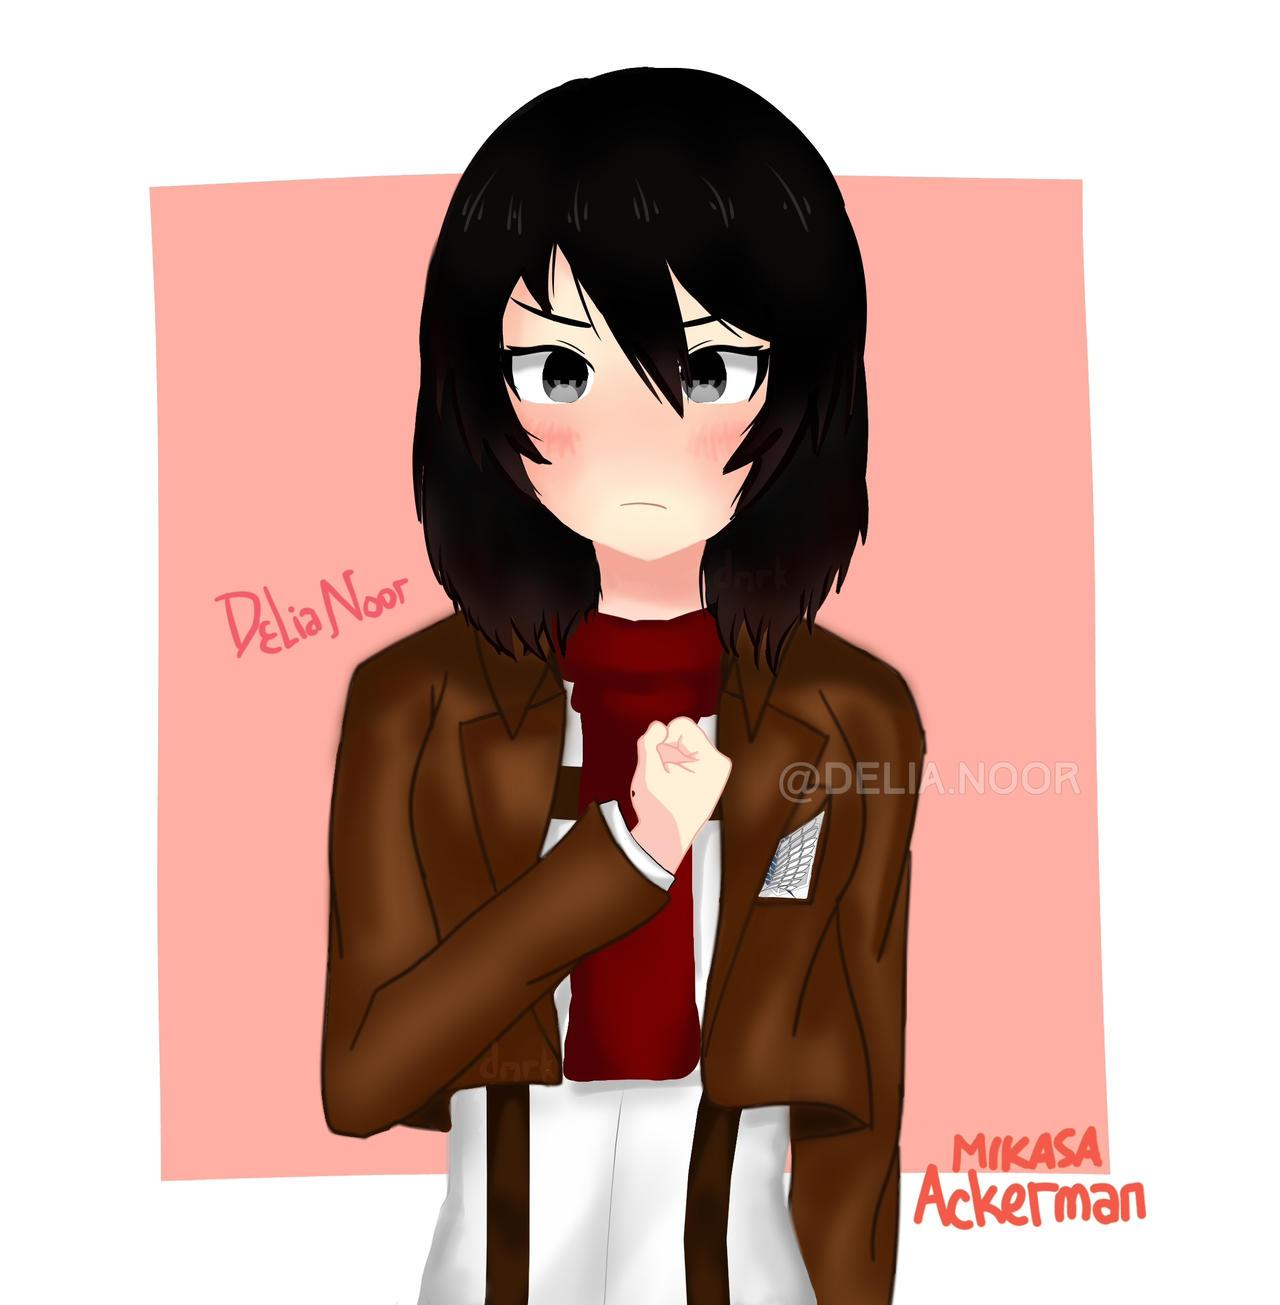 Mikasa Ackerman Snk Fanart By Deliasunshiners On Deviantart